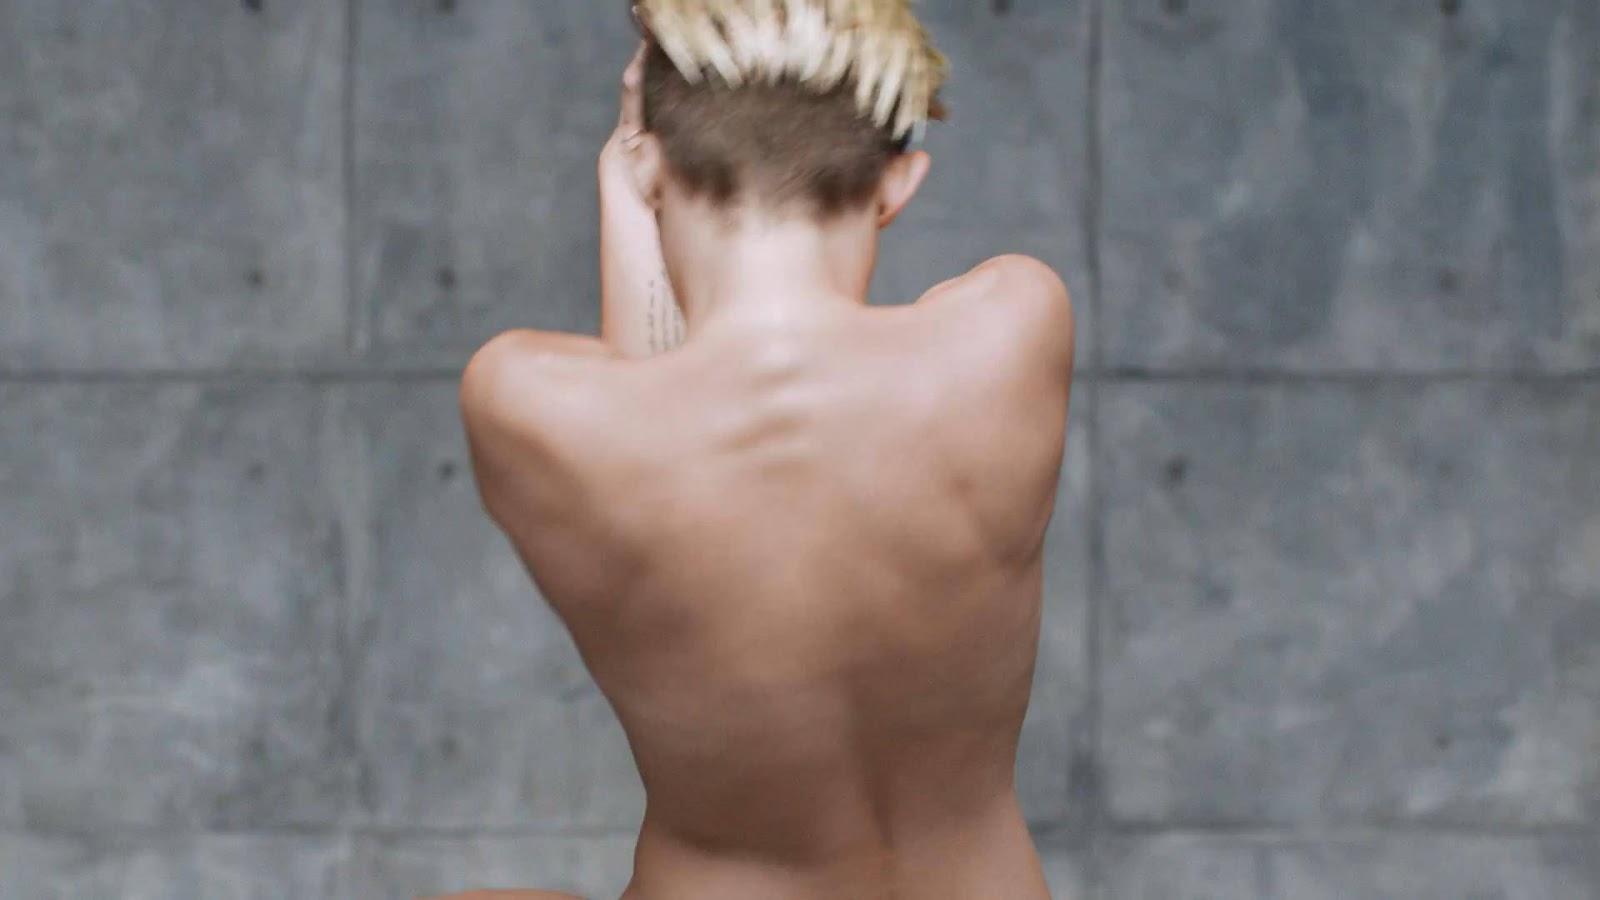 image Miley cyrus wrecking ball porn edit